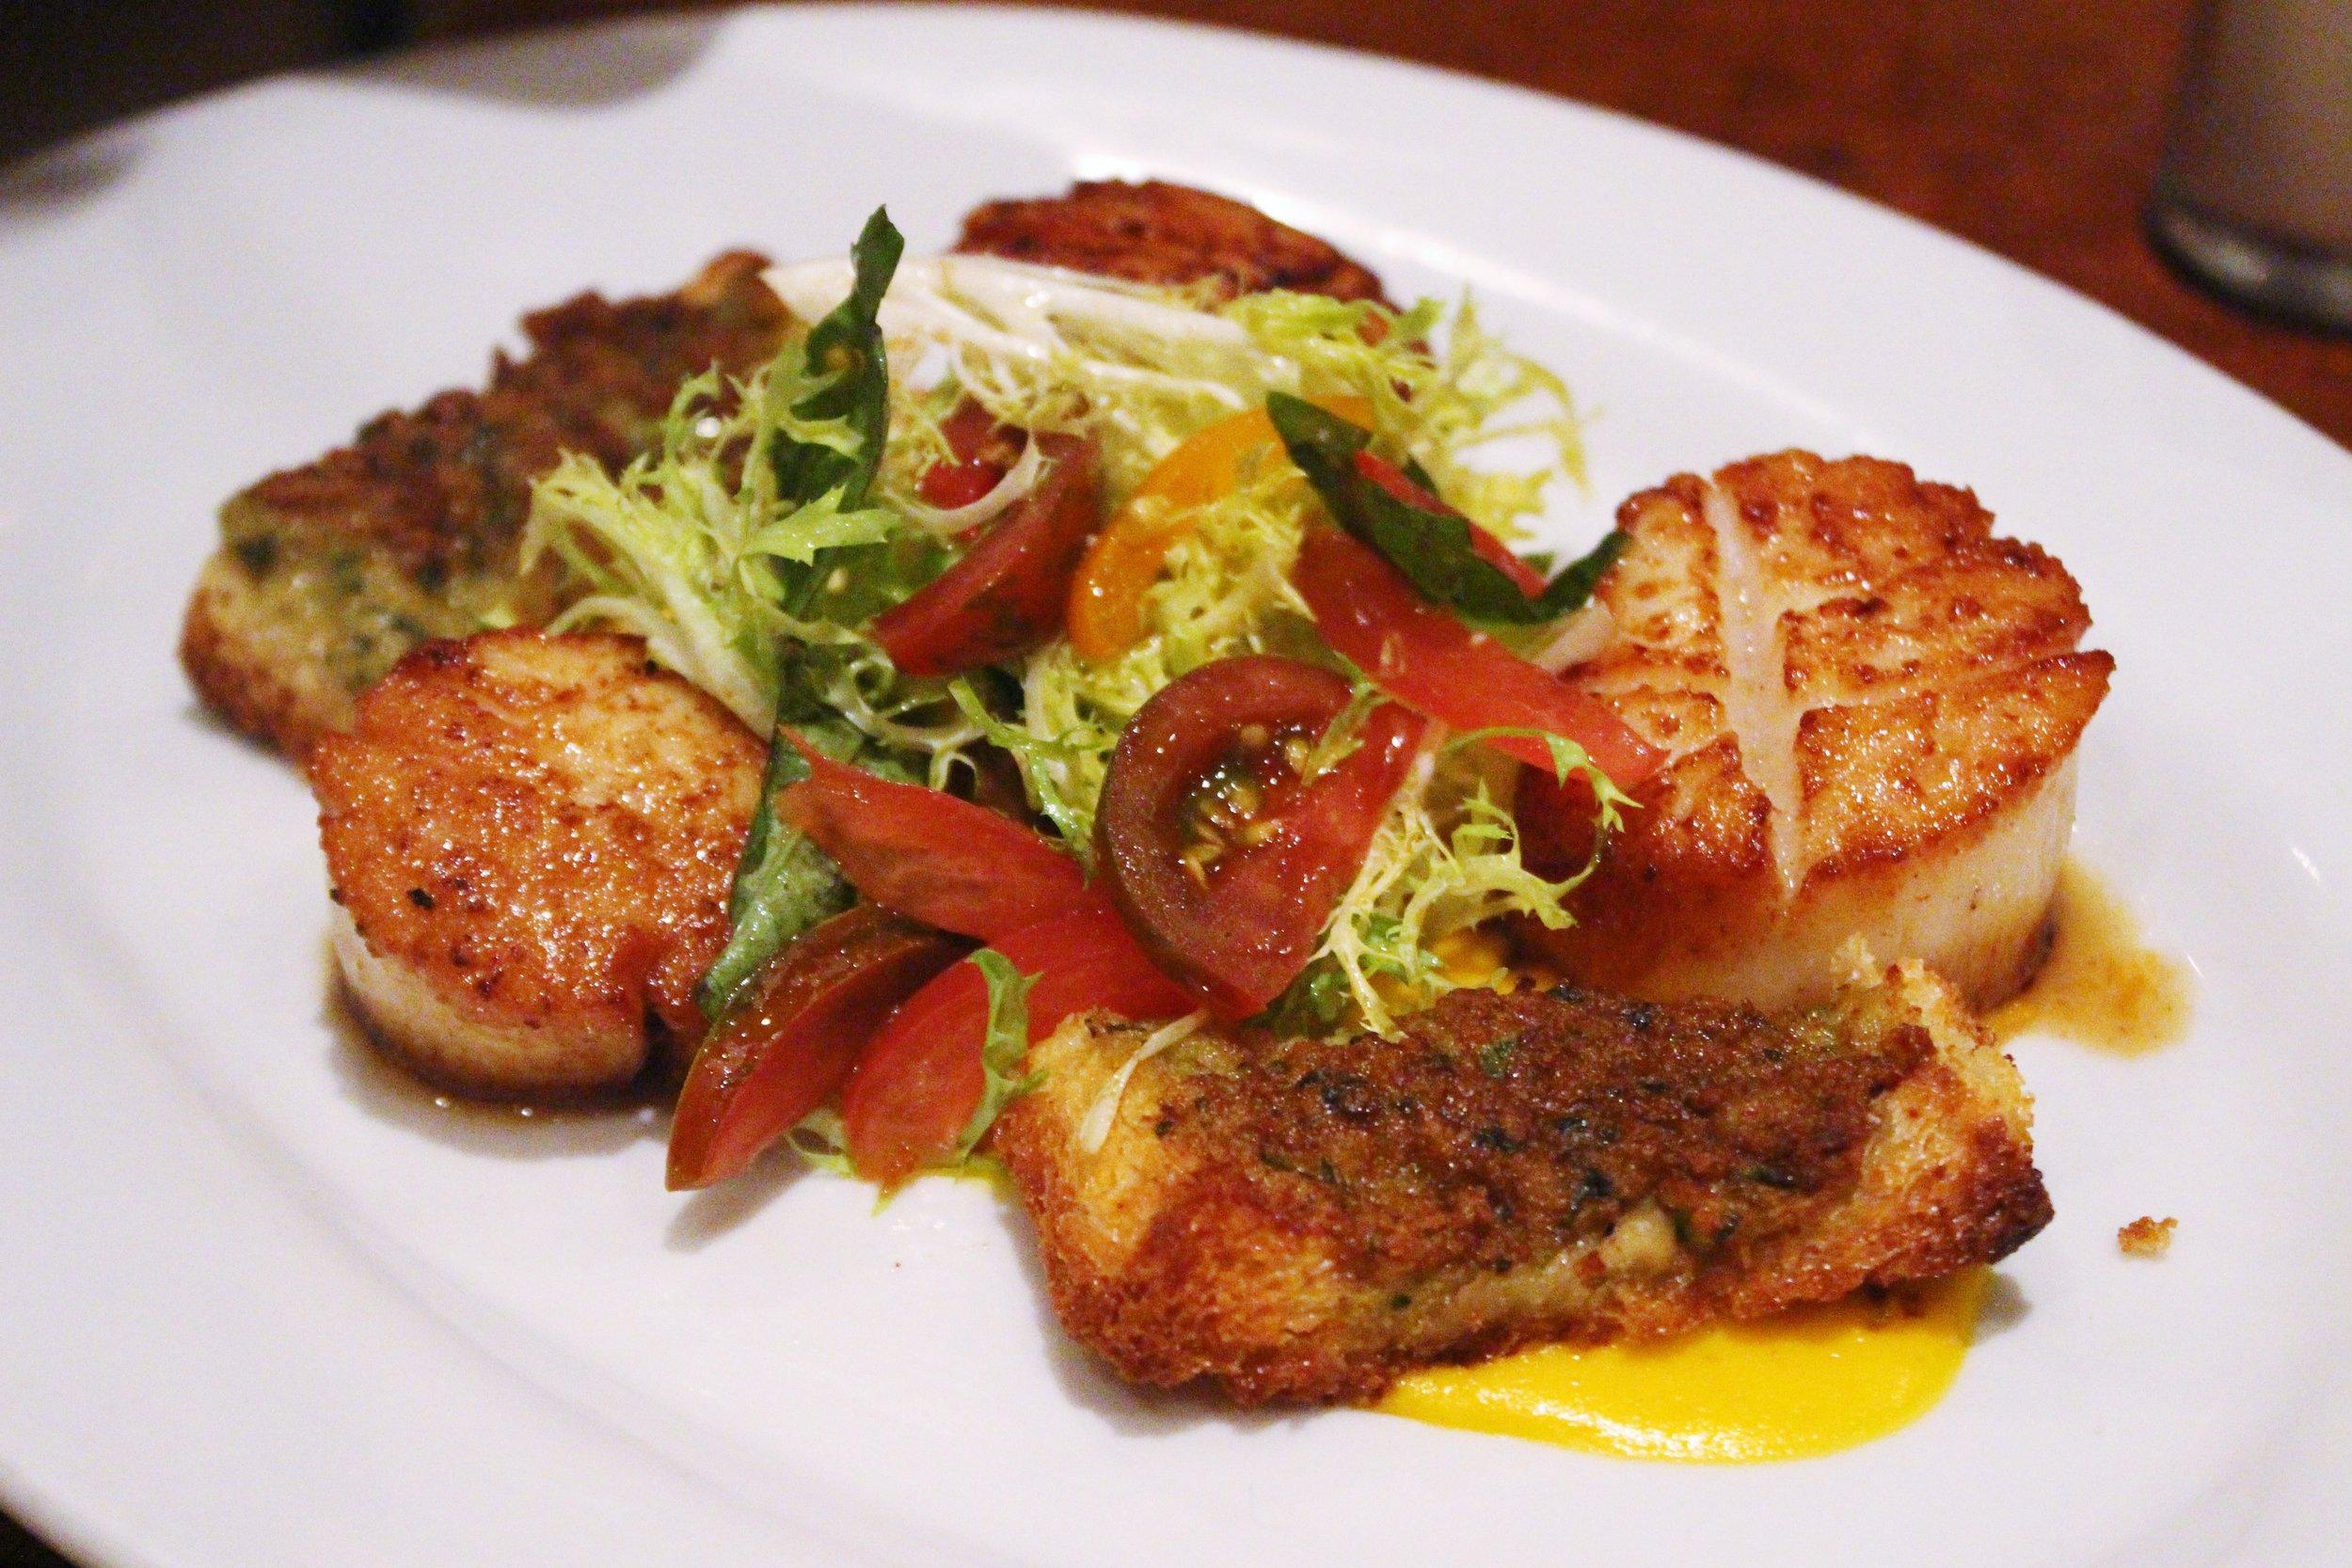 Seared Diver Scallops with Shrimp Toast, Tomato Fondue, and Basil Salad